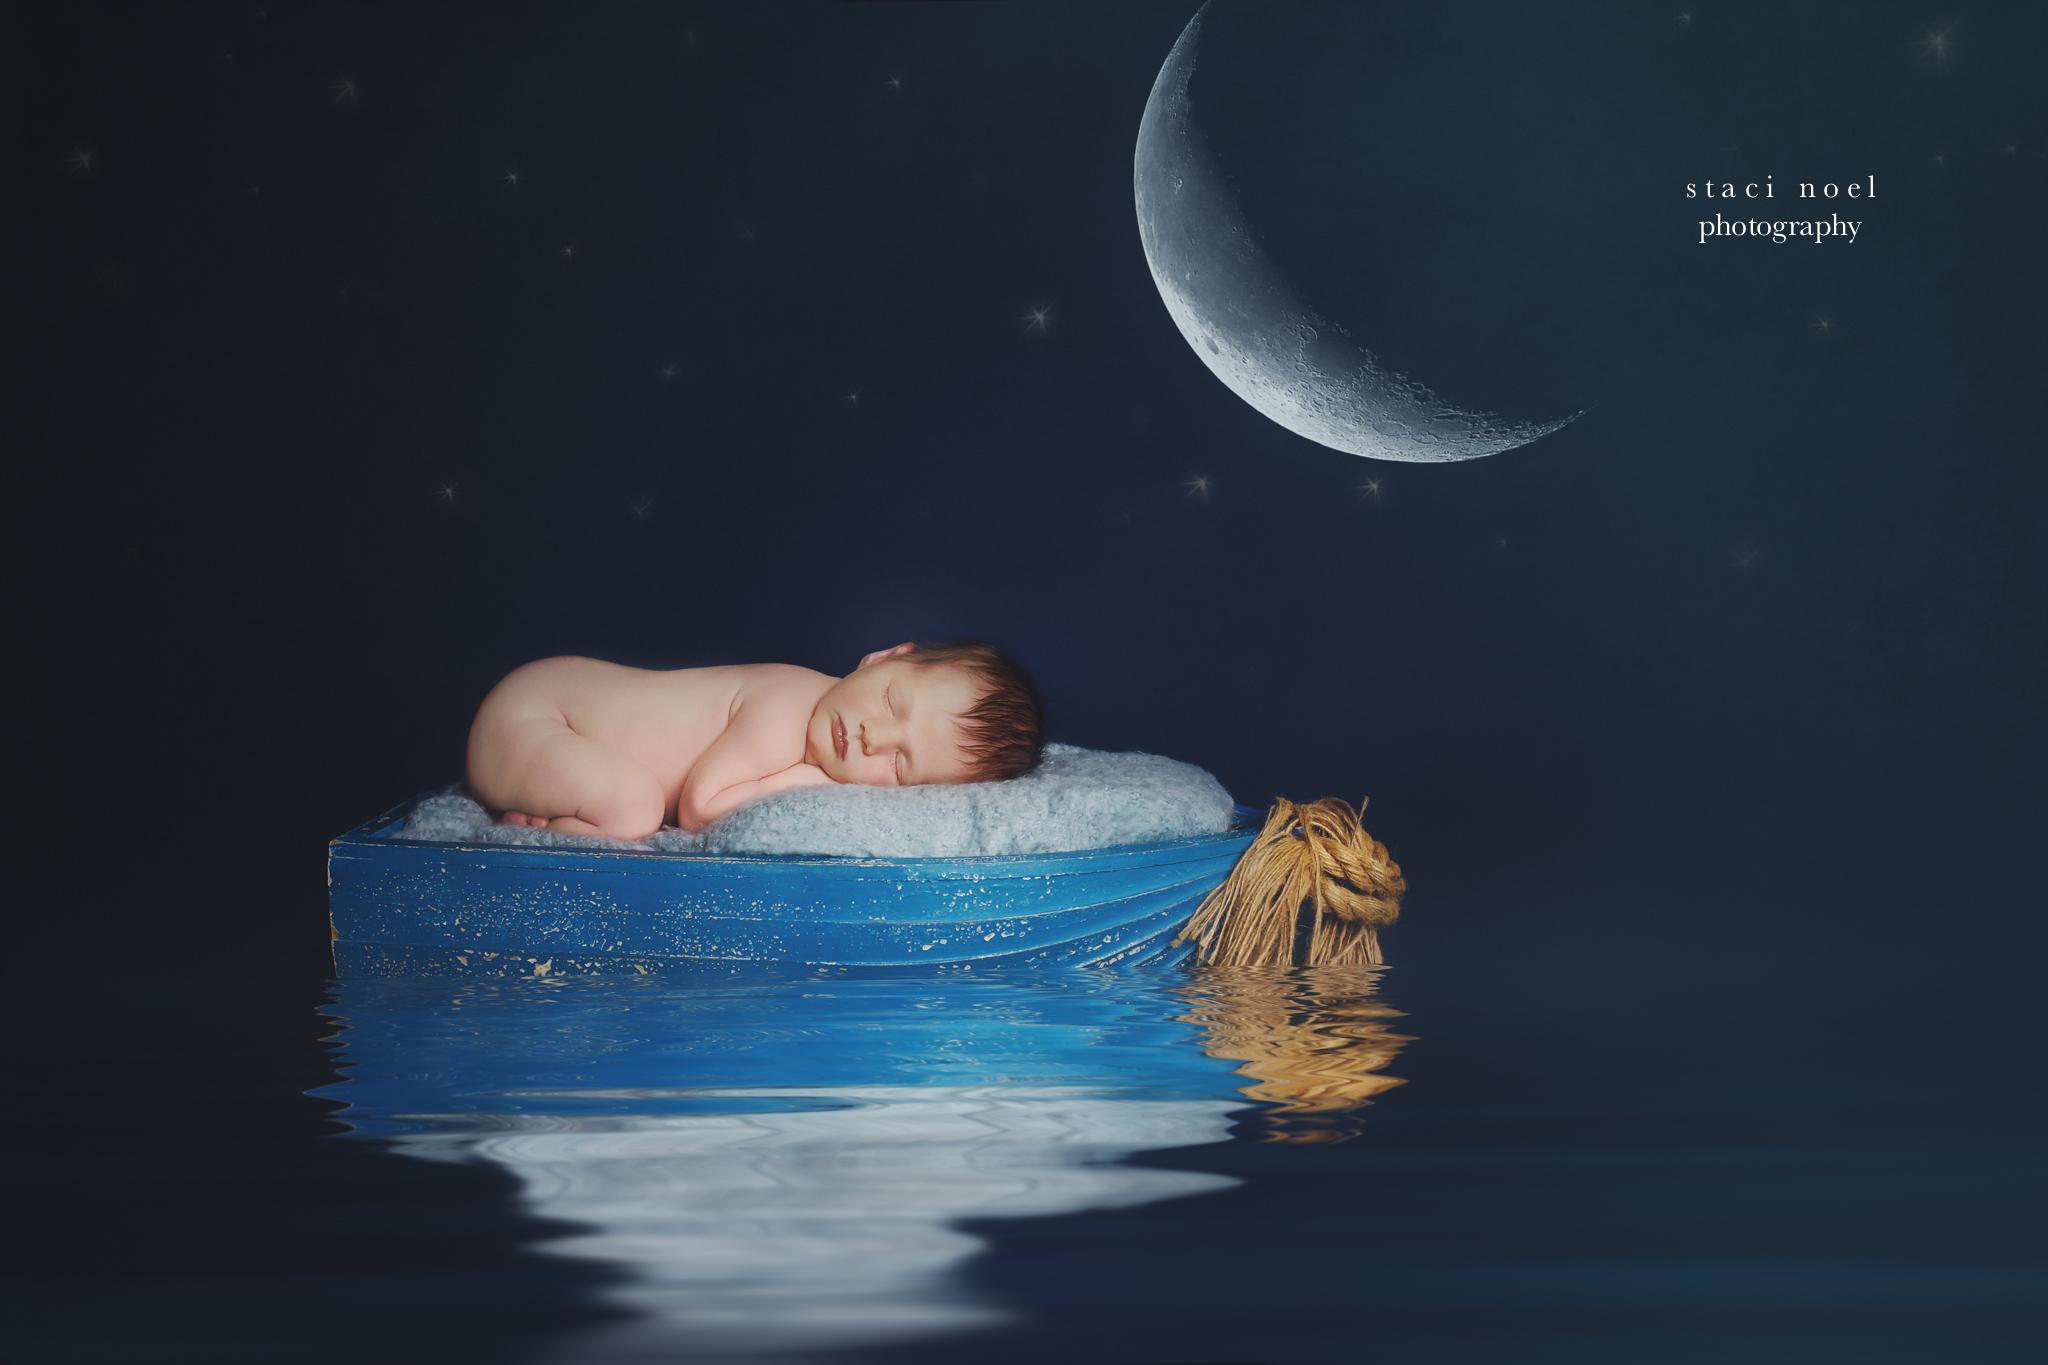 Staci Noel Photography captures newborn portrait of baby boy in charlotte nc